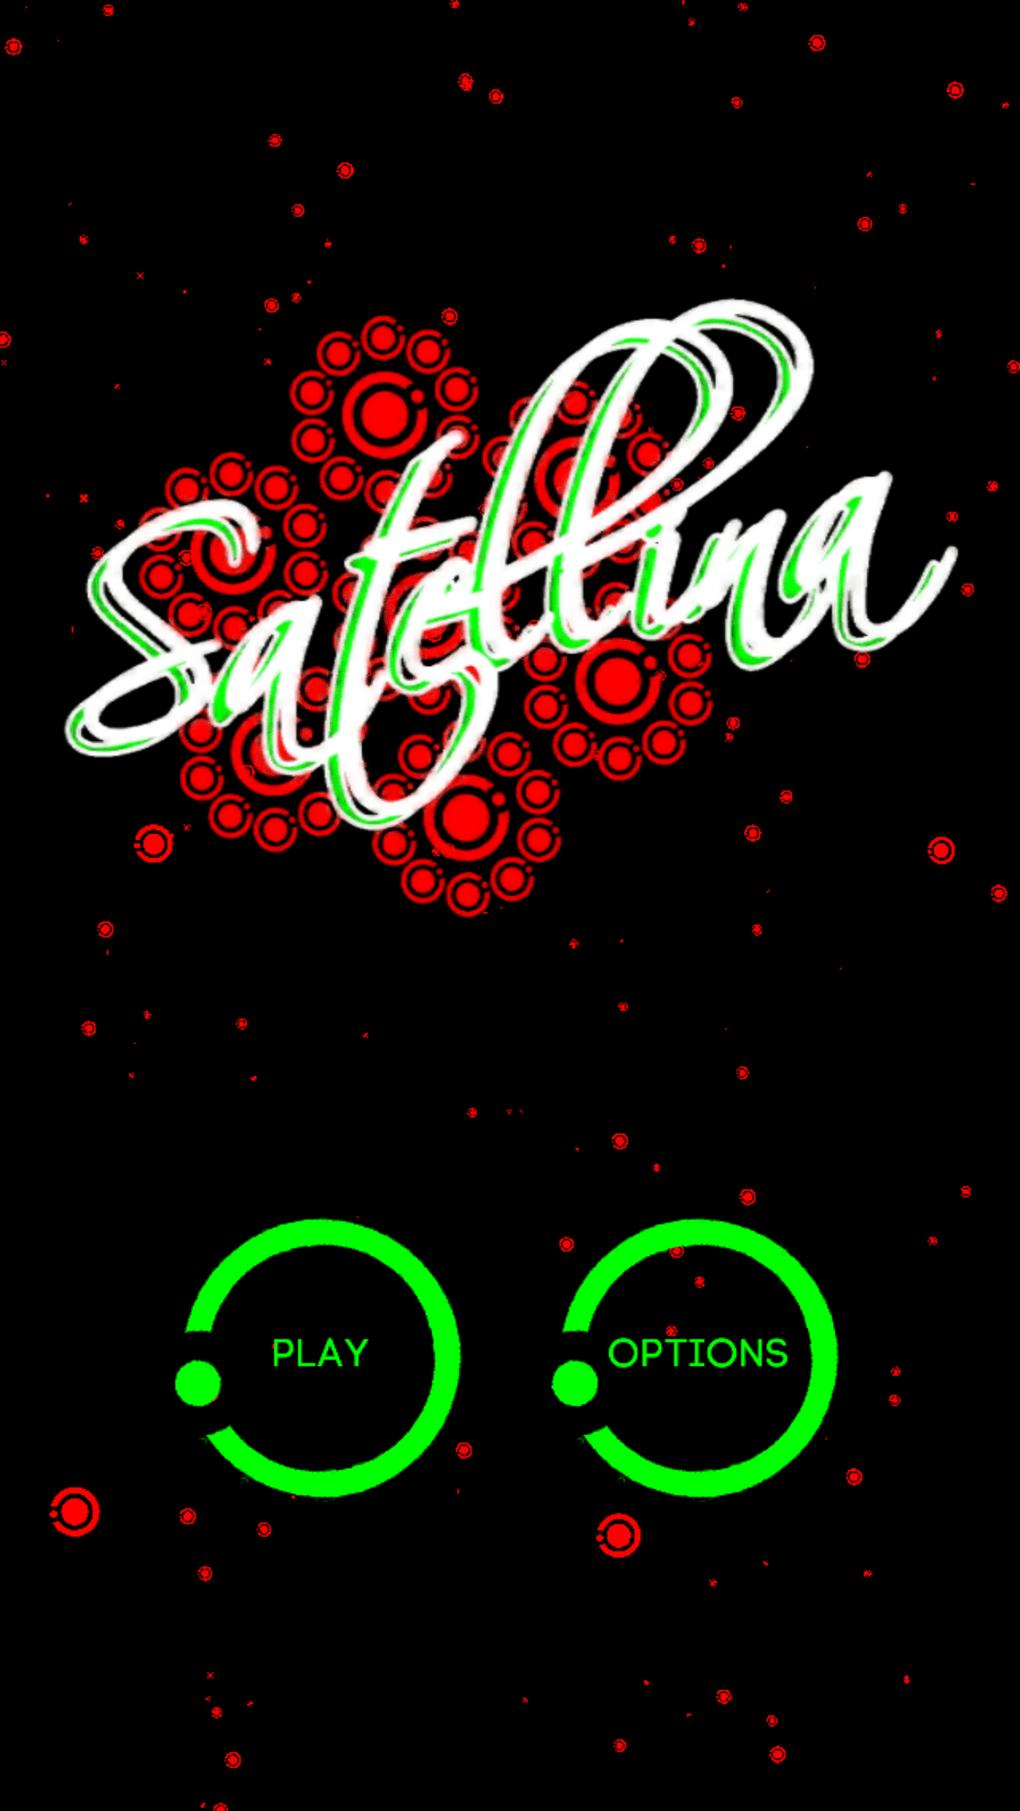 Satellina